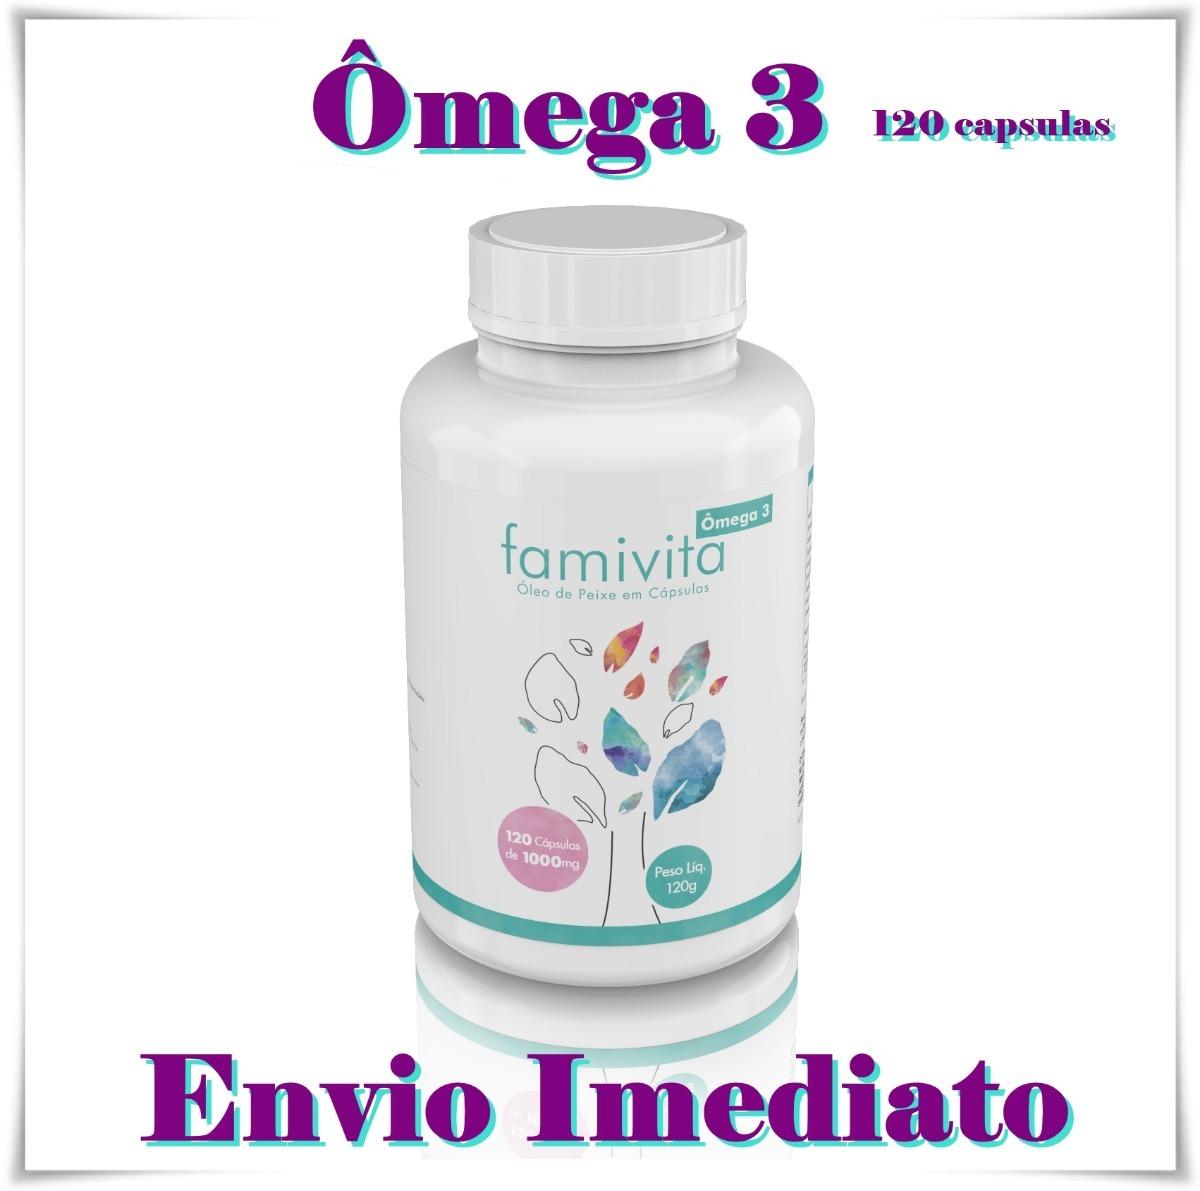 eafbc665305 ômega 3 anti-inflamatório 120 cápsulas 1000mg famivita. Carregando zoom.